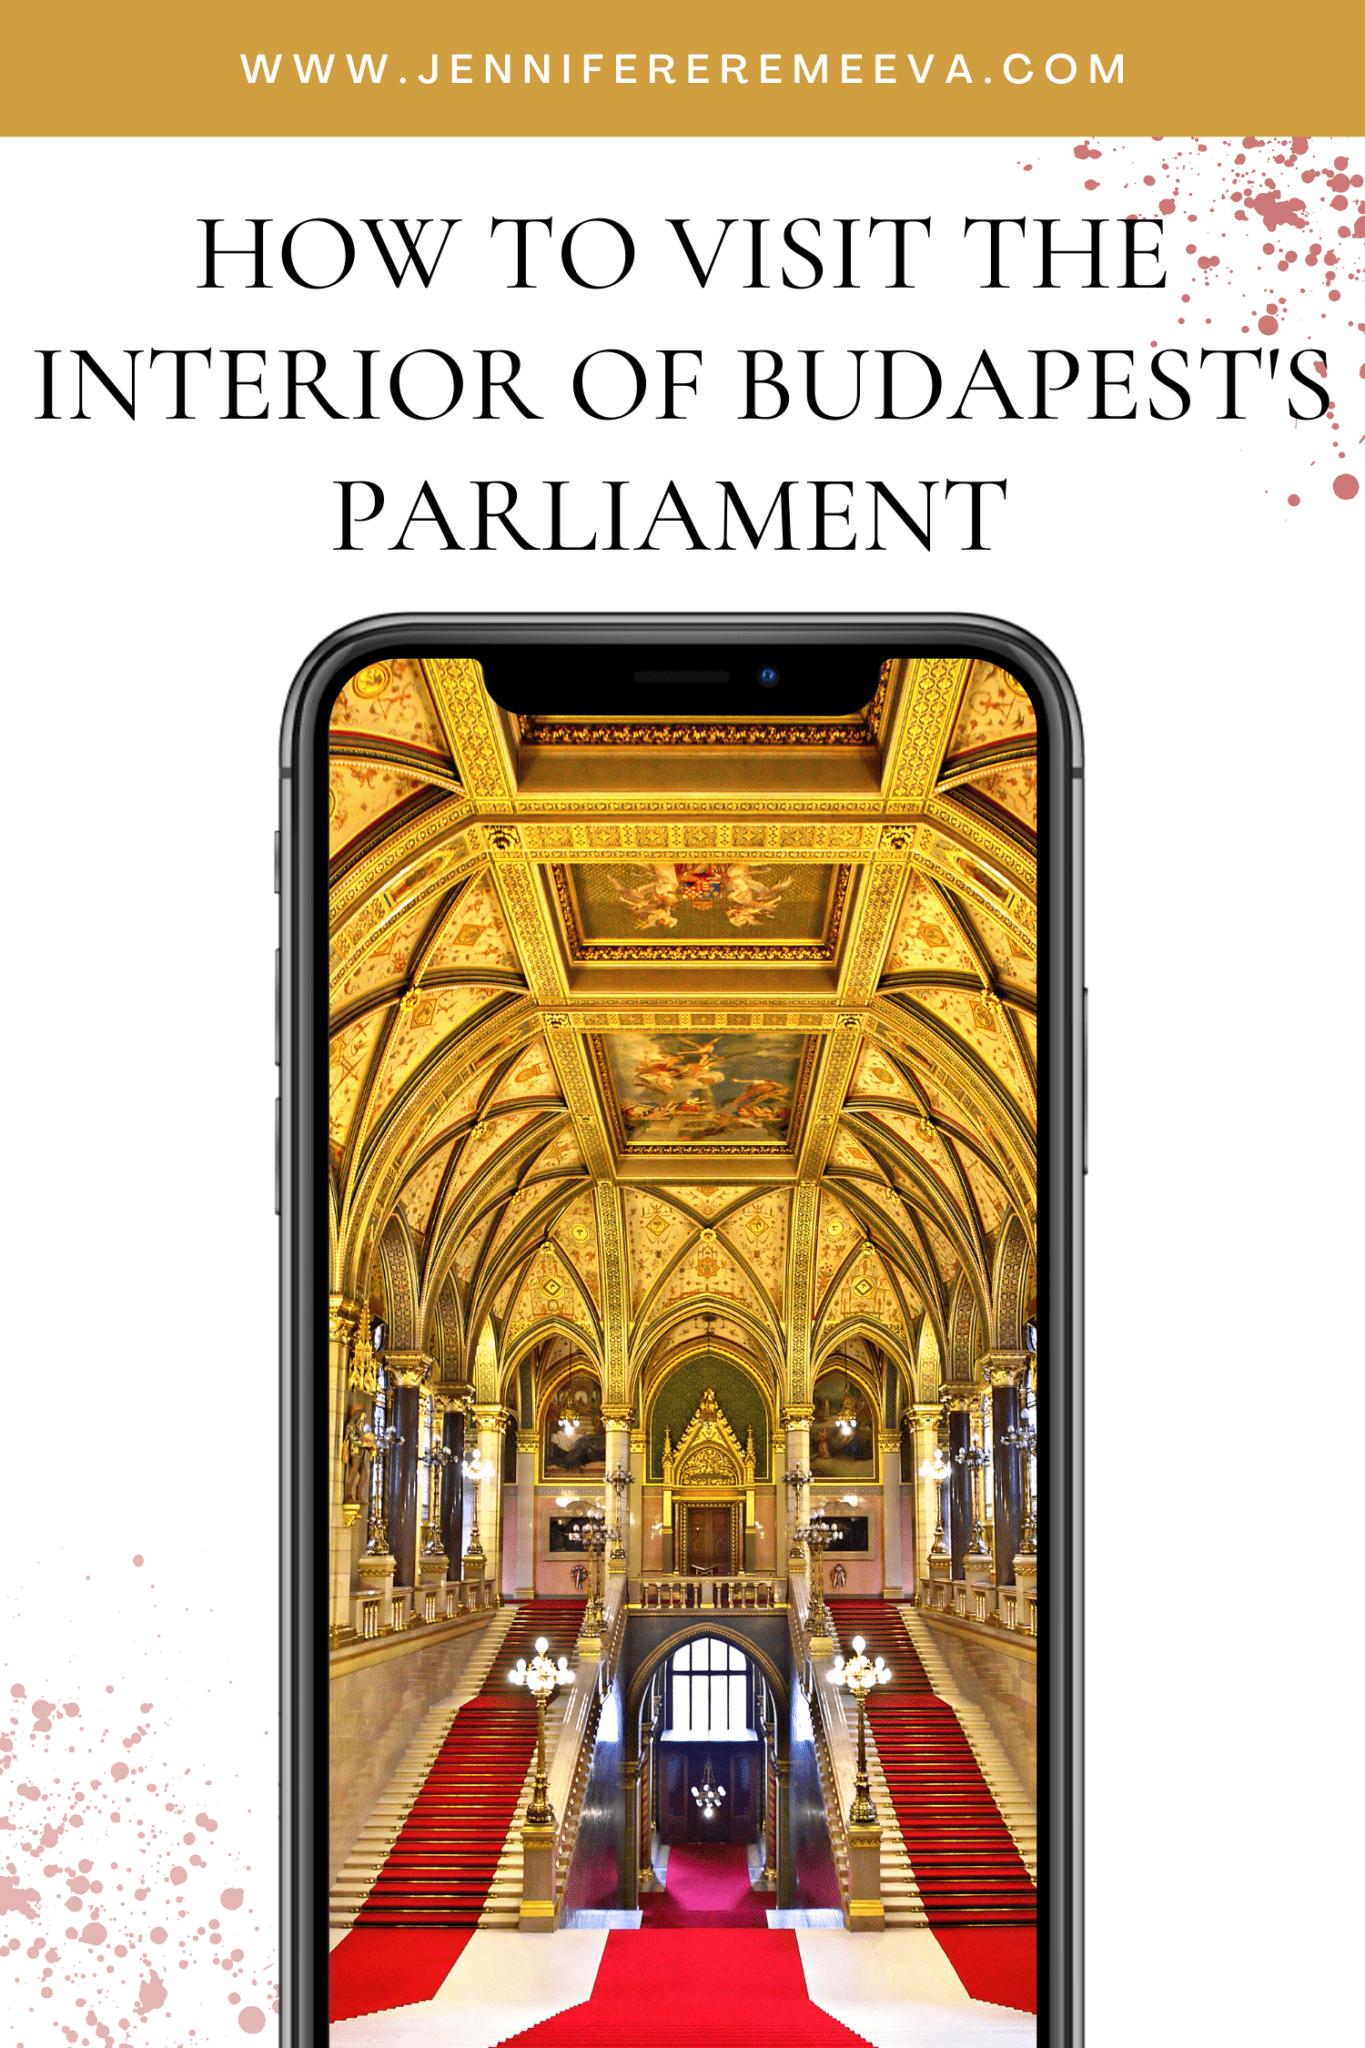 Budapest's Parliament Building illuminated at night